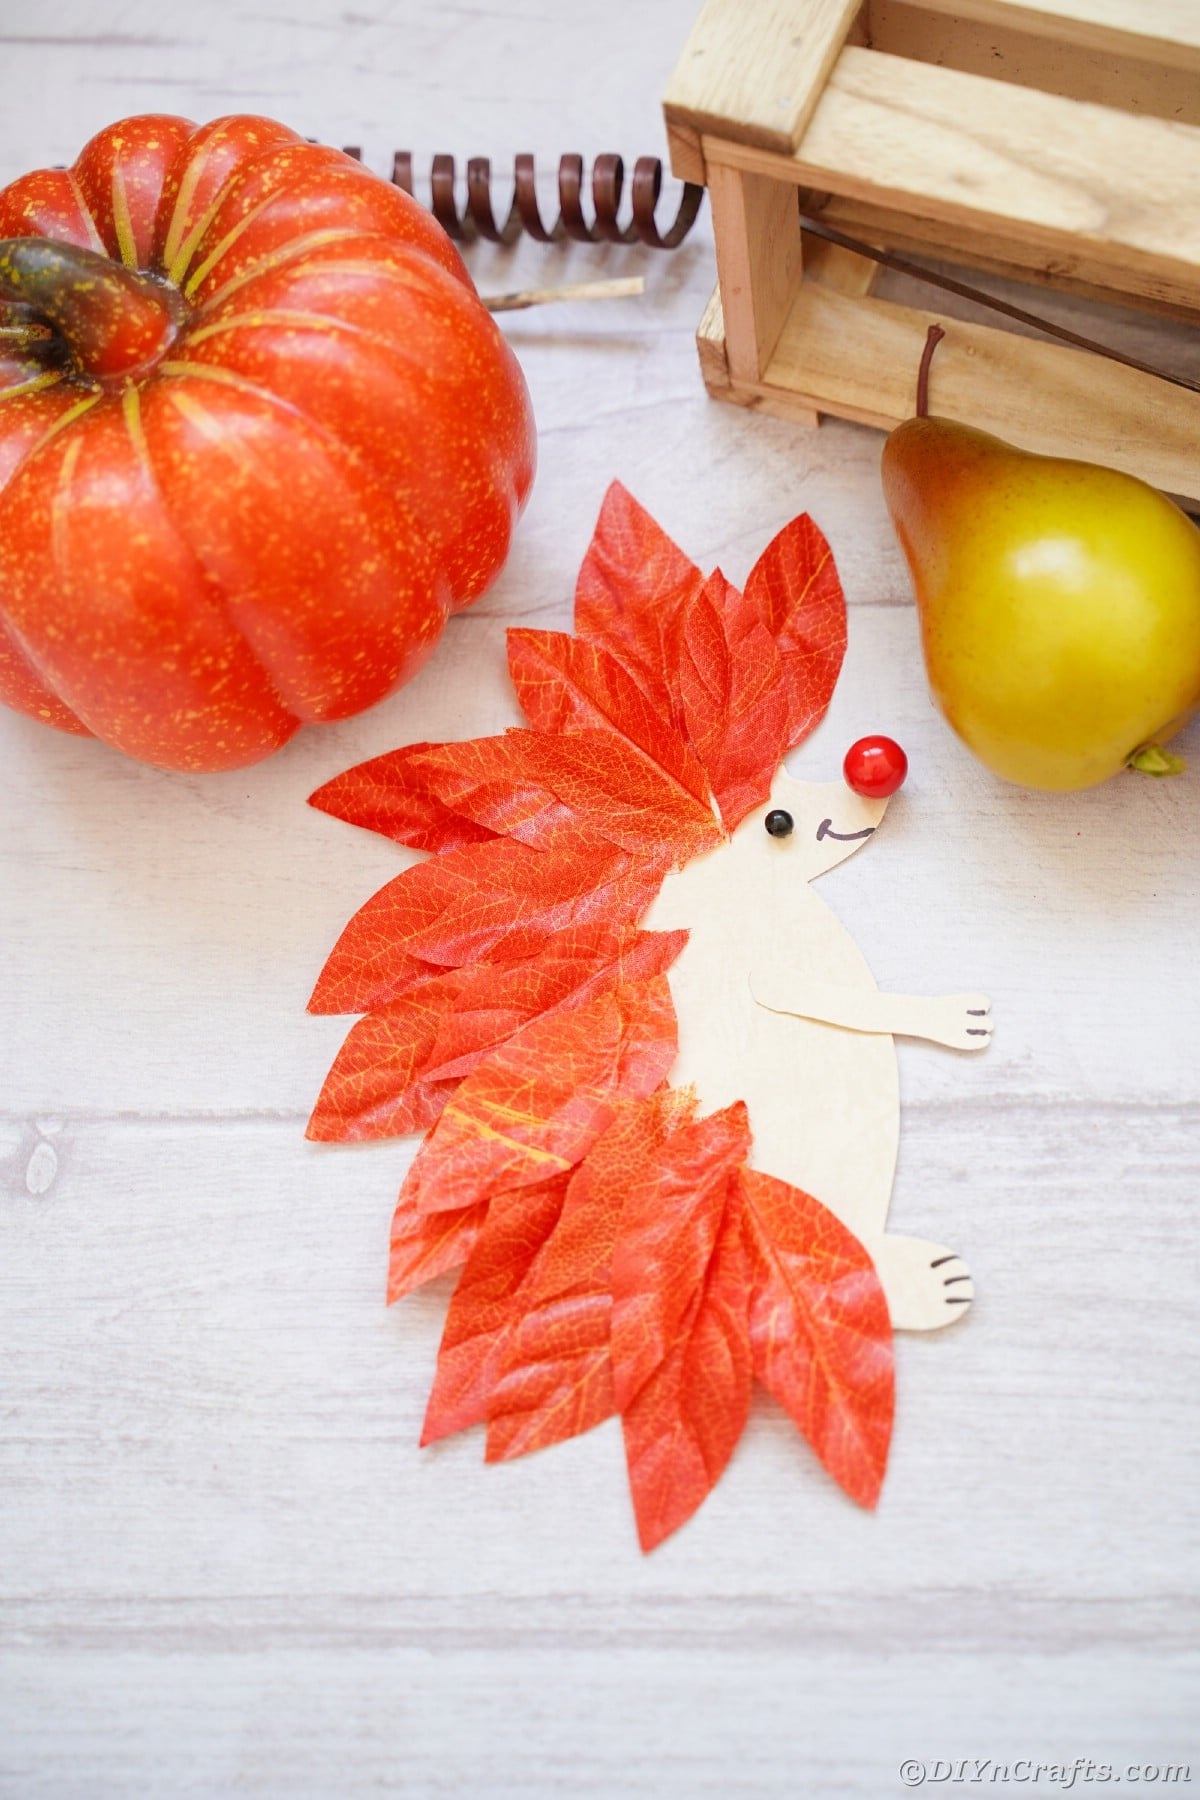 Paper and leaf hedgehog laying on white wood slat